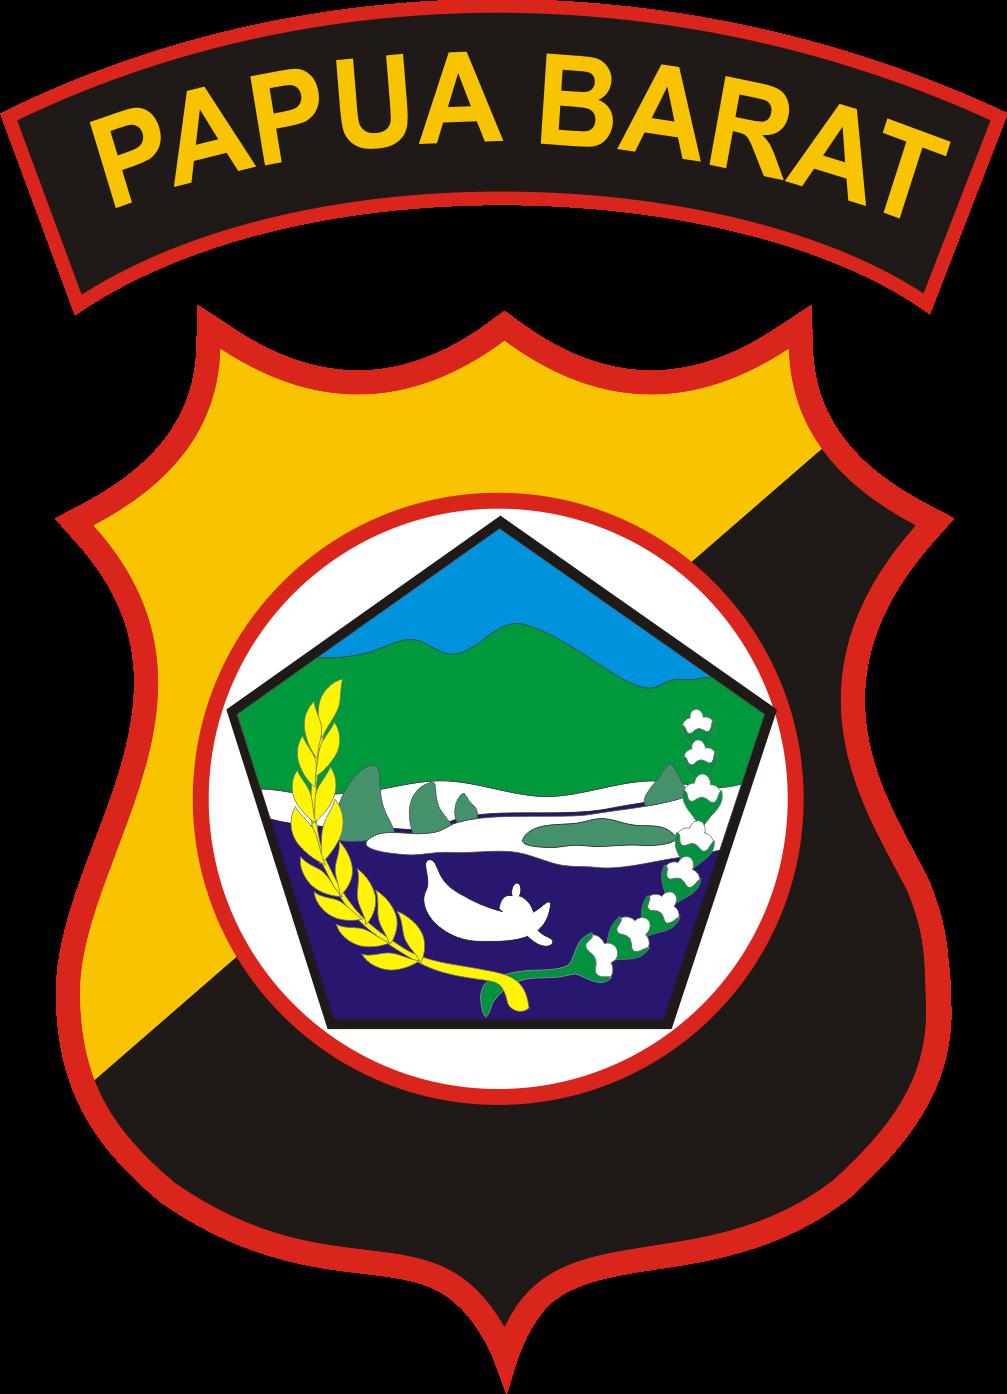 LogoLambang Resmi Polda Papua Barat Format Vector